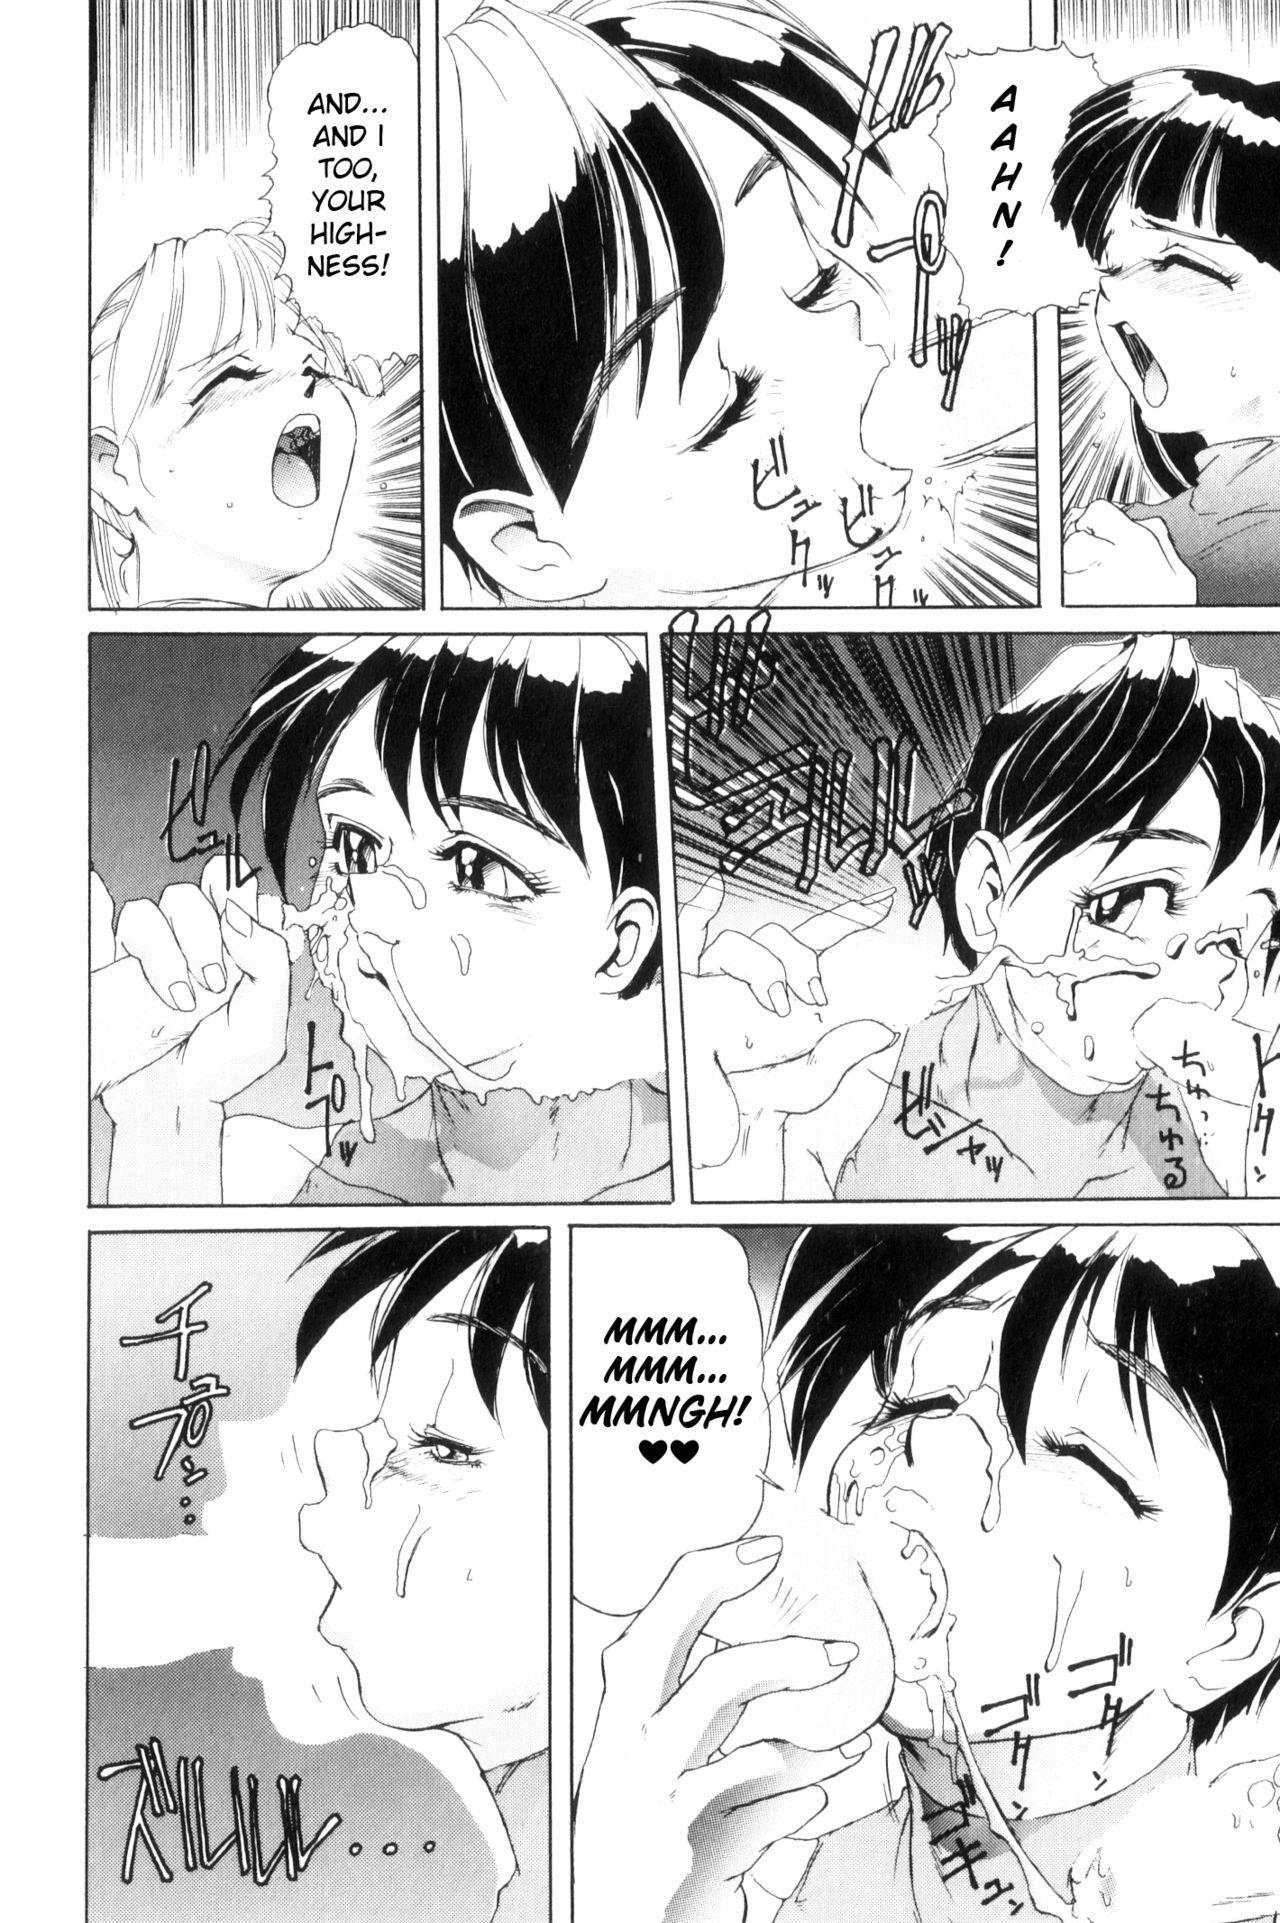 [NeWMeN] Secret Plot [Shinsouban] Ch. 1-6 [English] 126